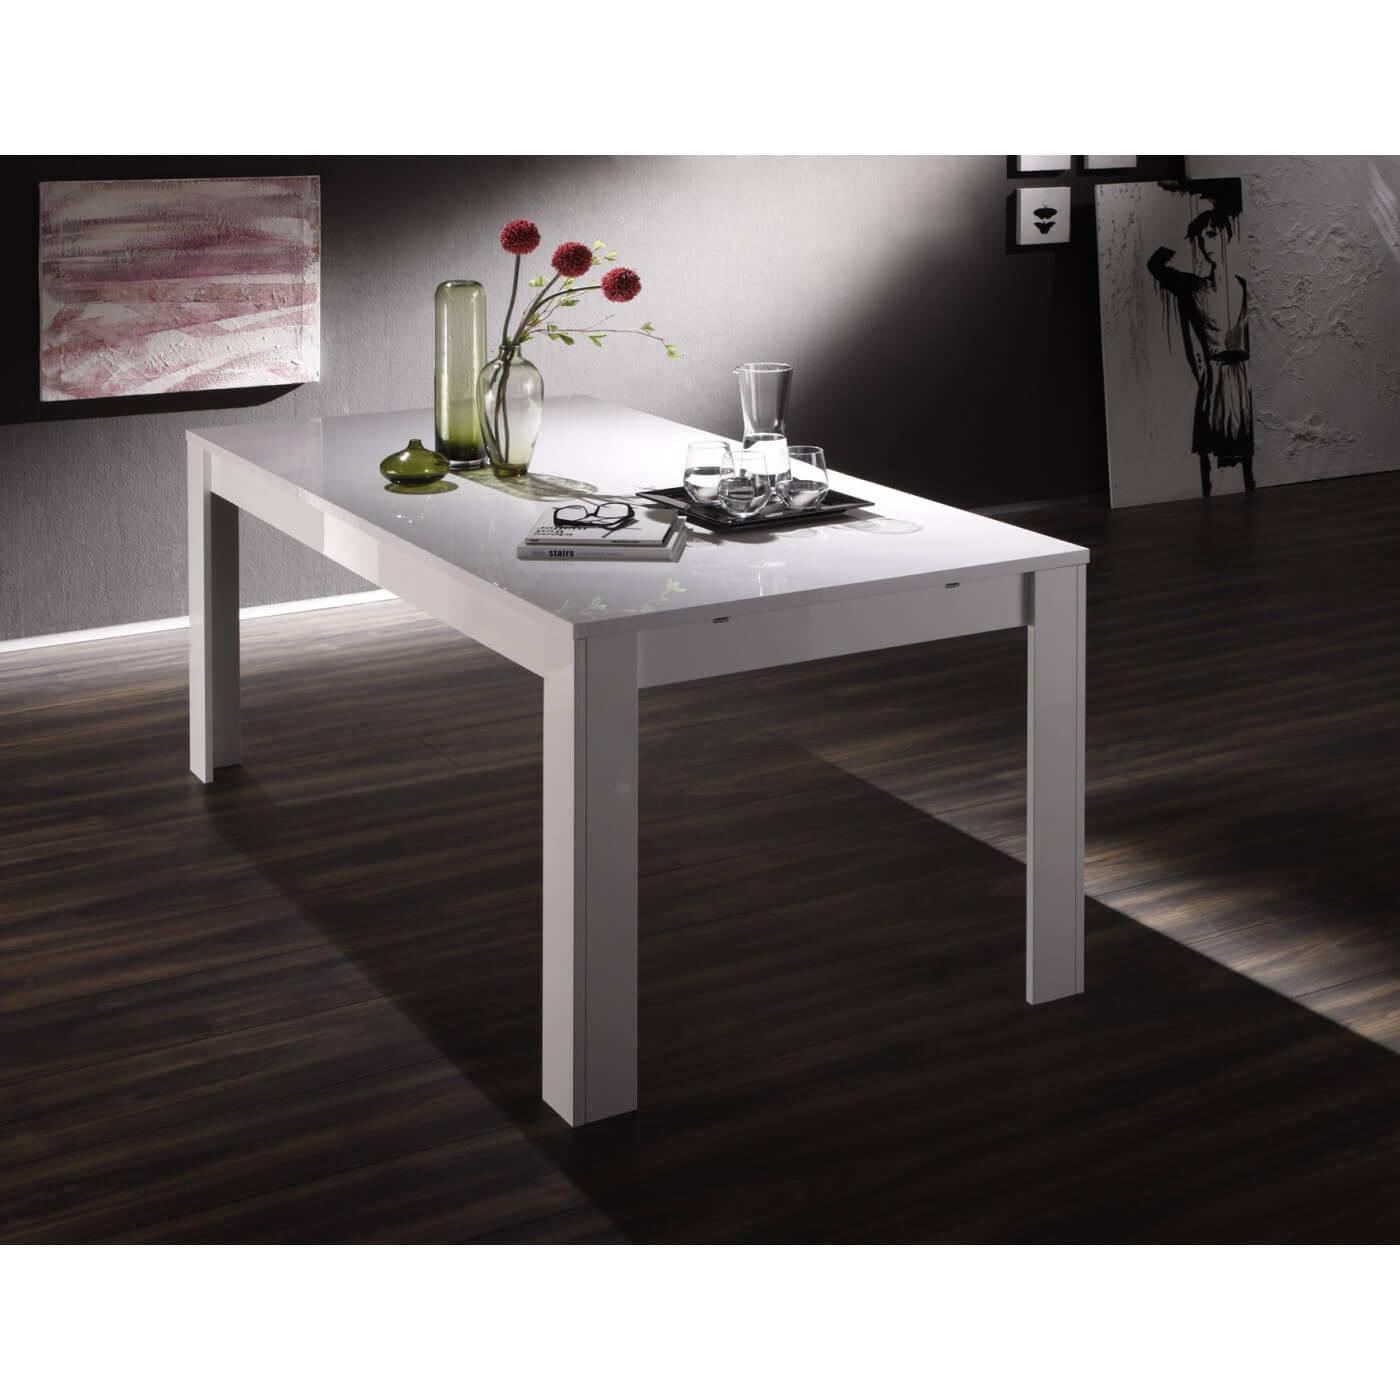 Table de salle manger design laqu blanc judy matelpro - Table design salle a manger ...